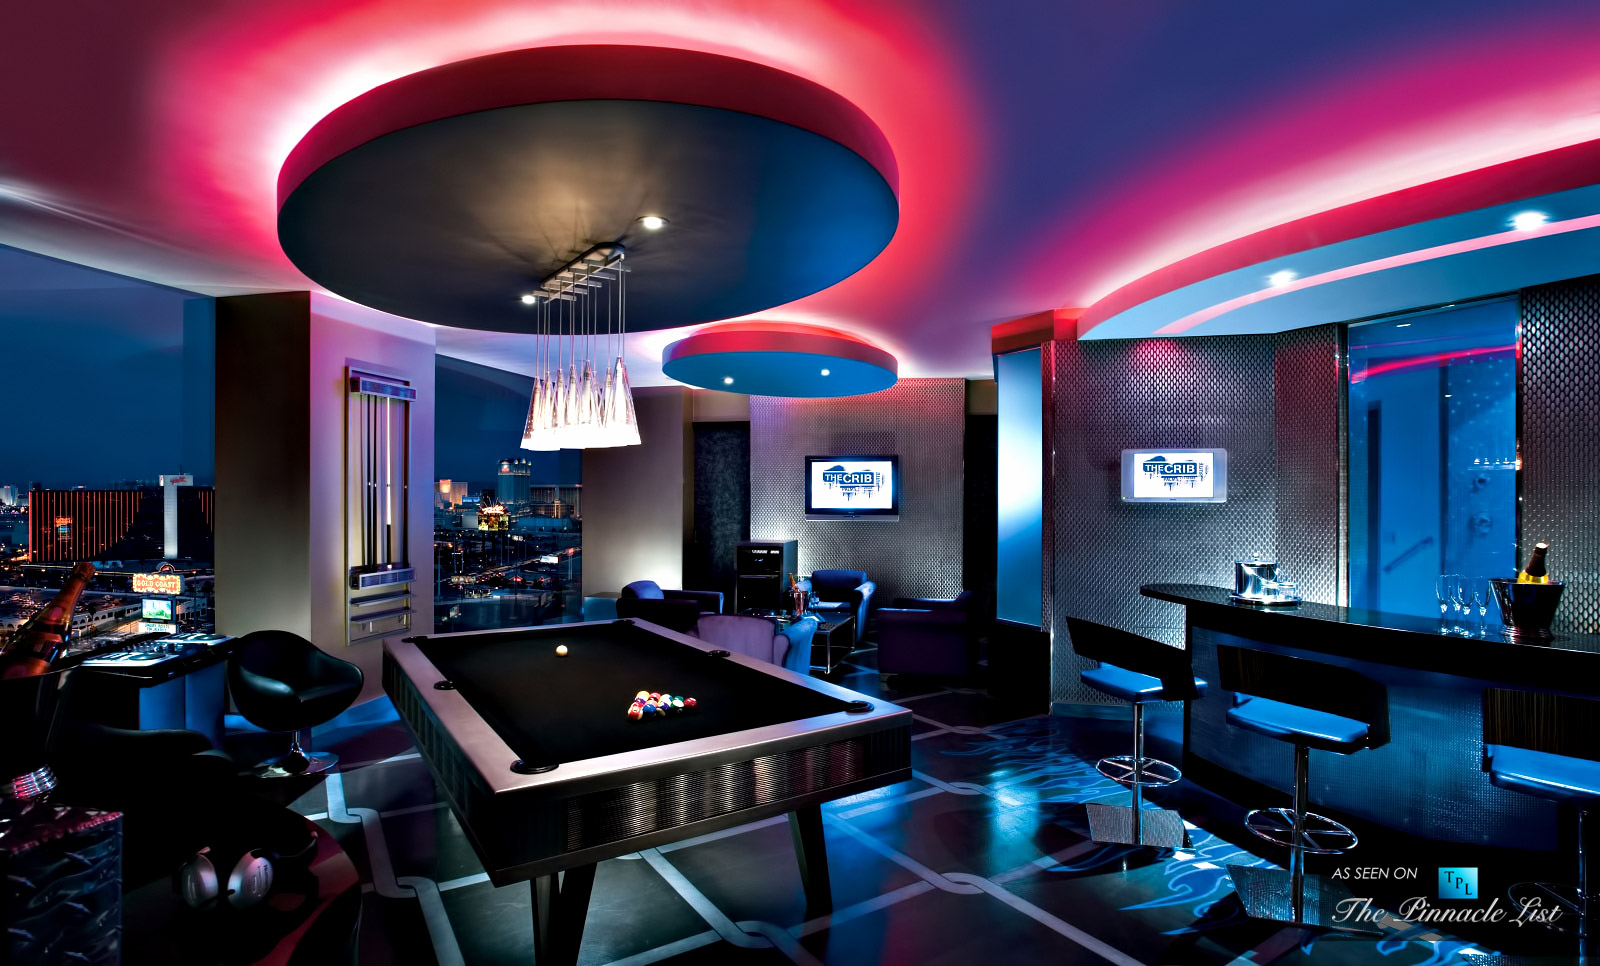 Palms Casino Resort Las Vegas - Experience the High Life at this Nevada Casino